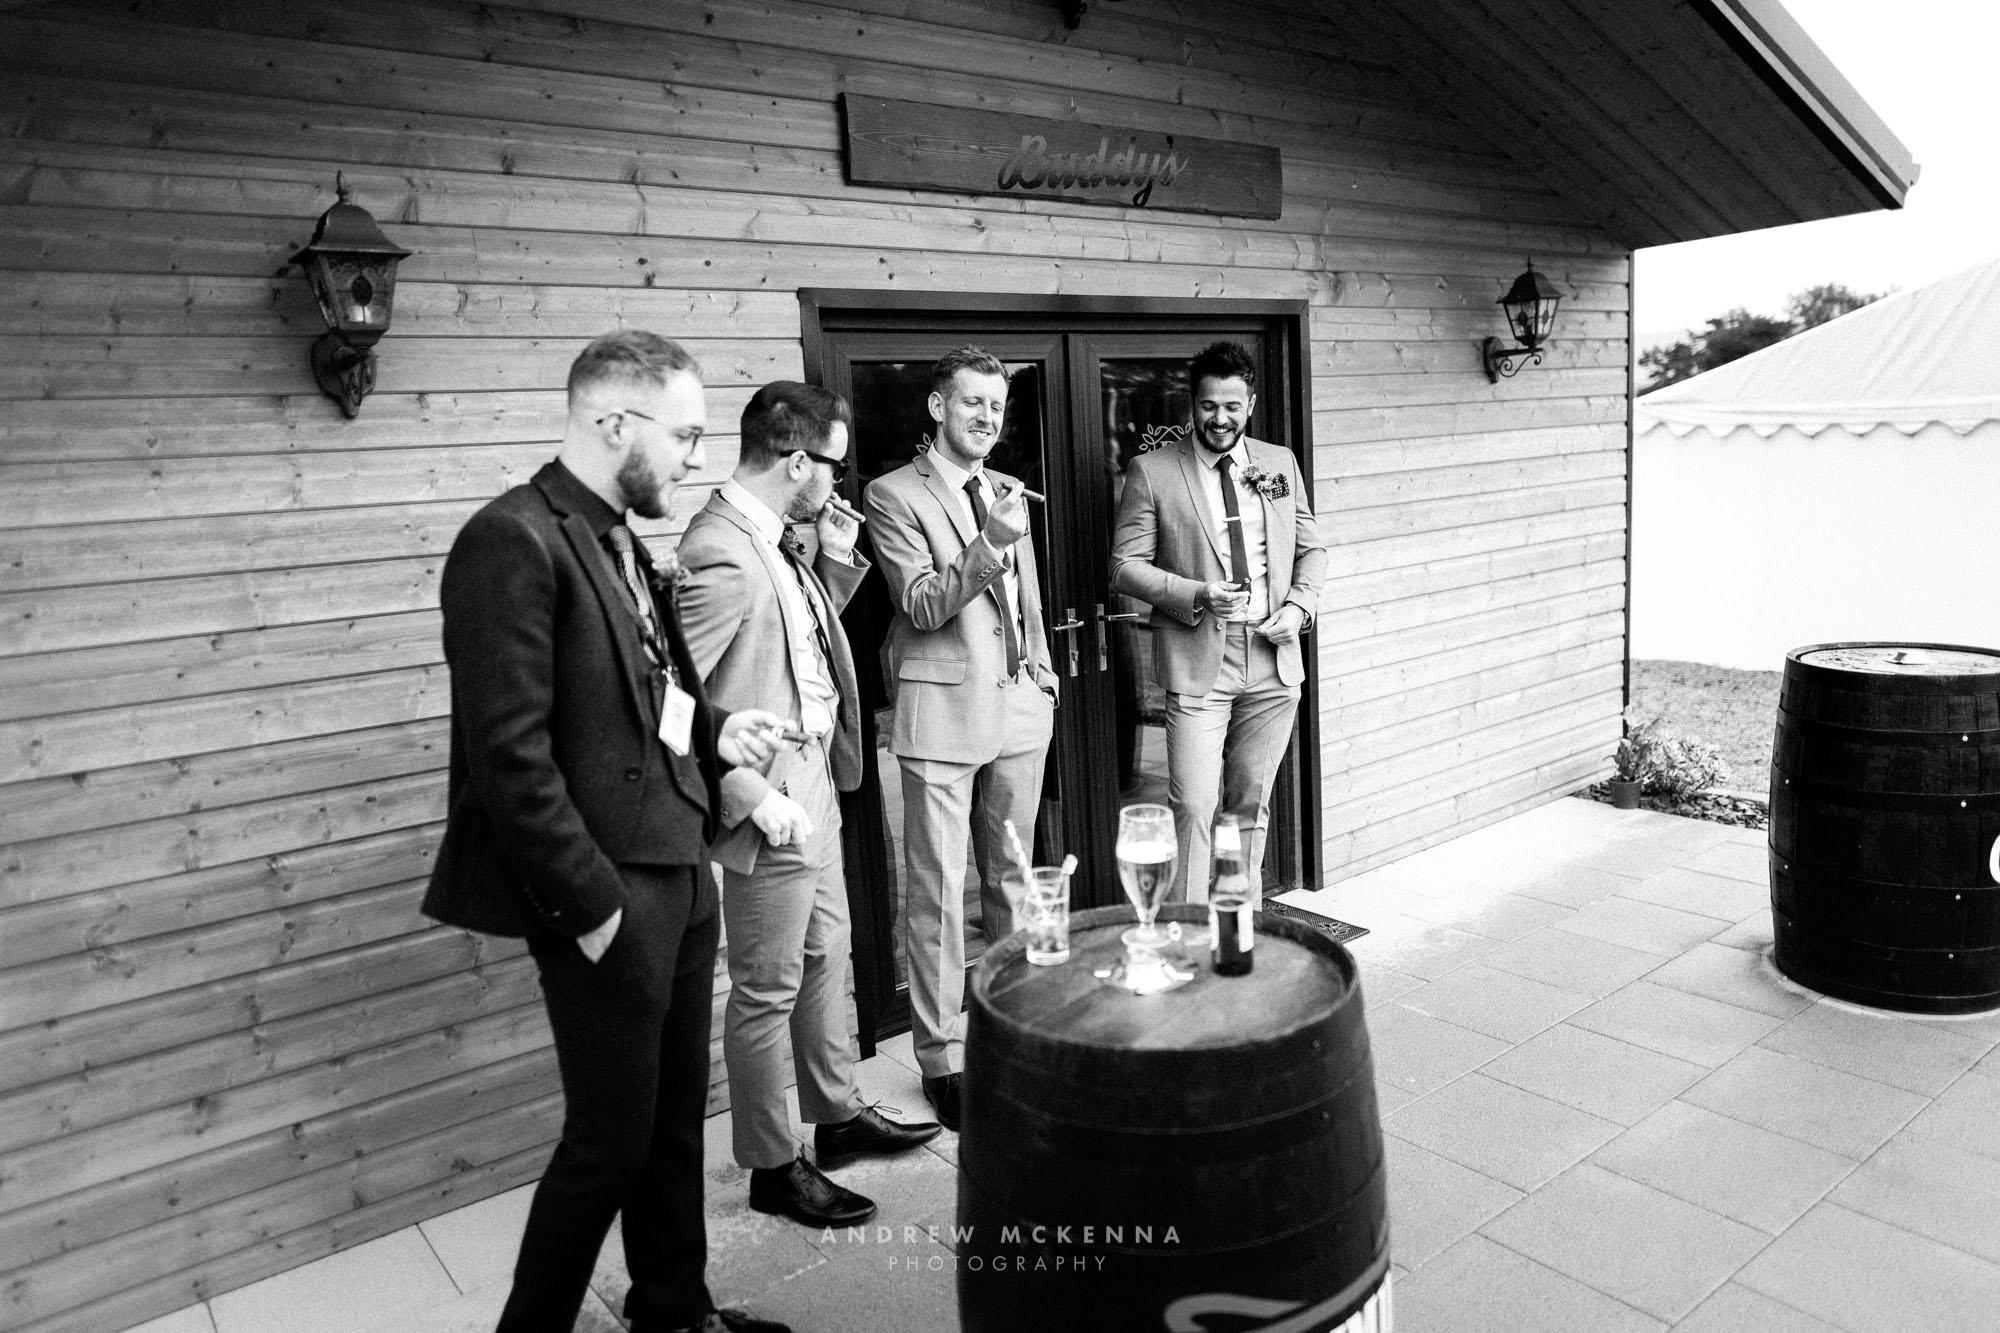 Samantha & Ricky - Rossharbour Wedding Photography Northern Irel